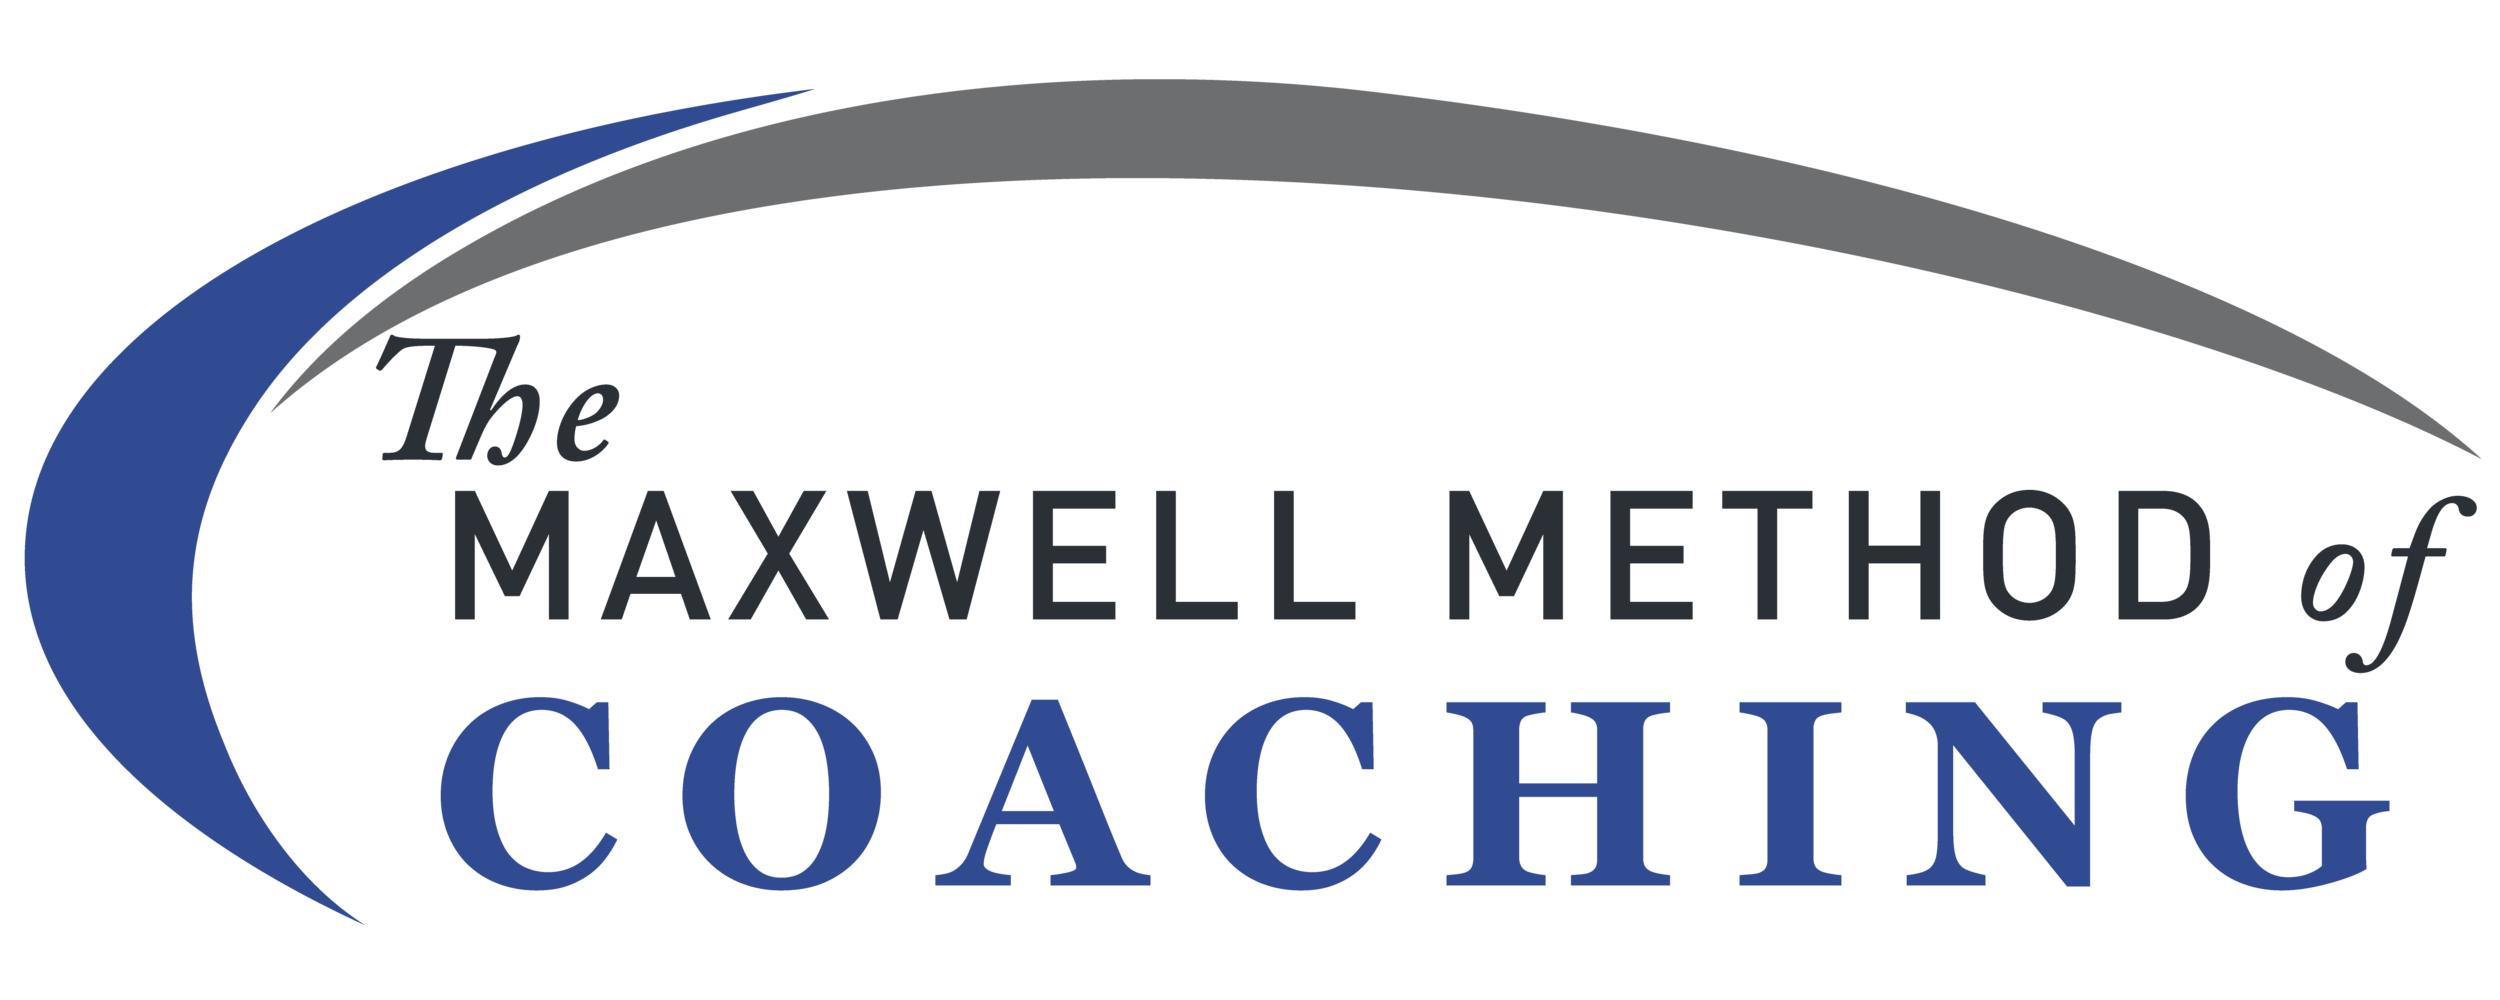 Maxwell-Method-Coaching.png